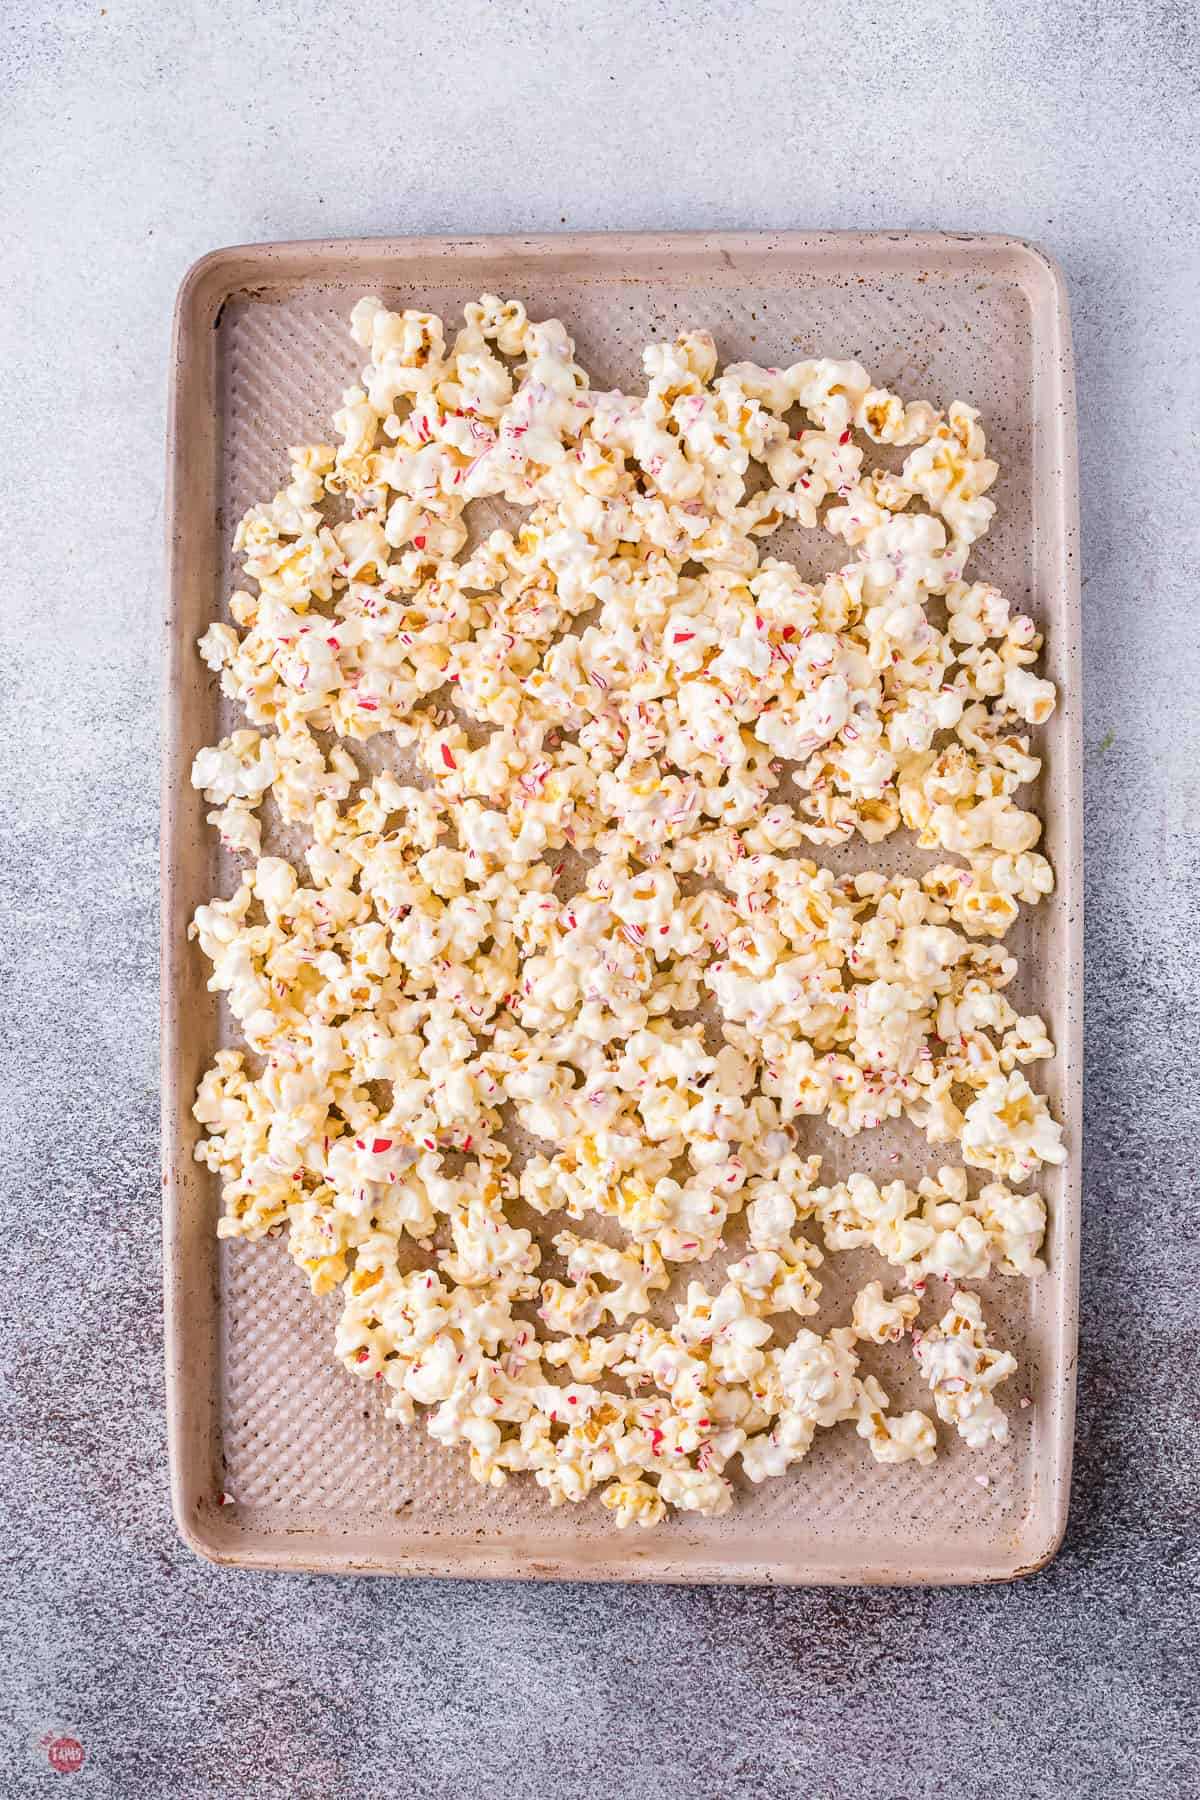 white chocolate popcorn on a baking sheet